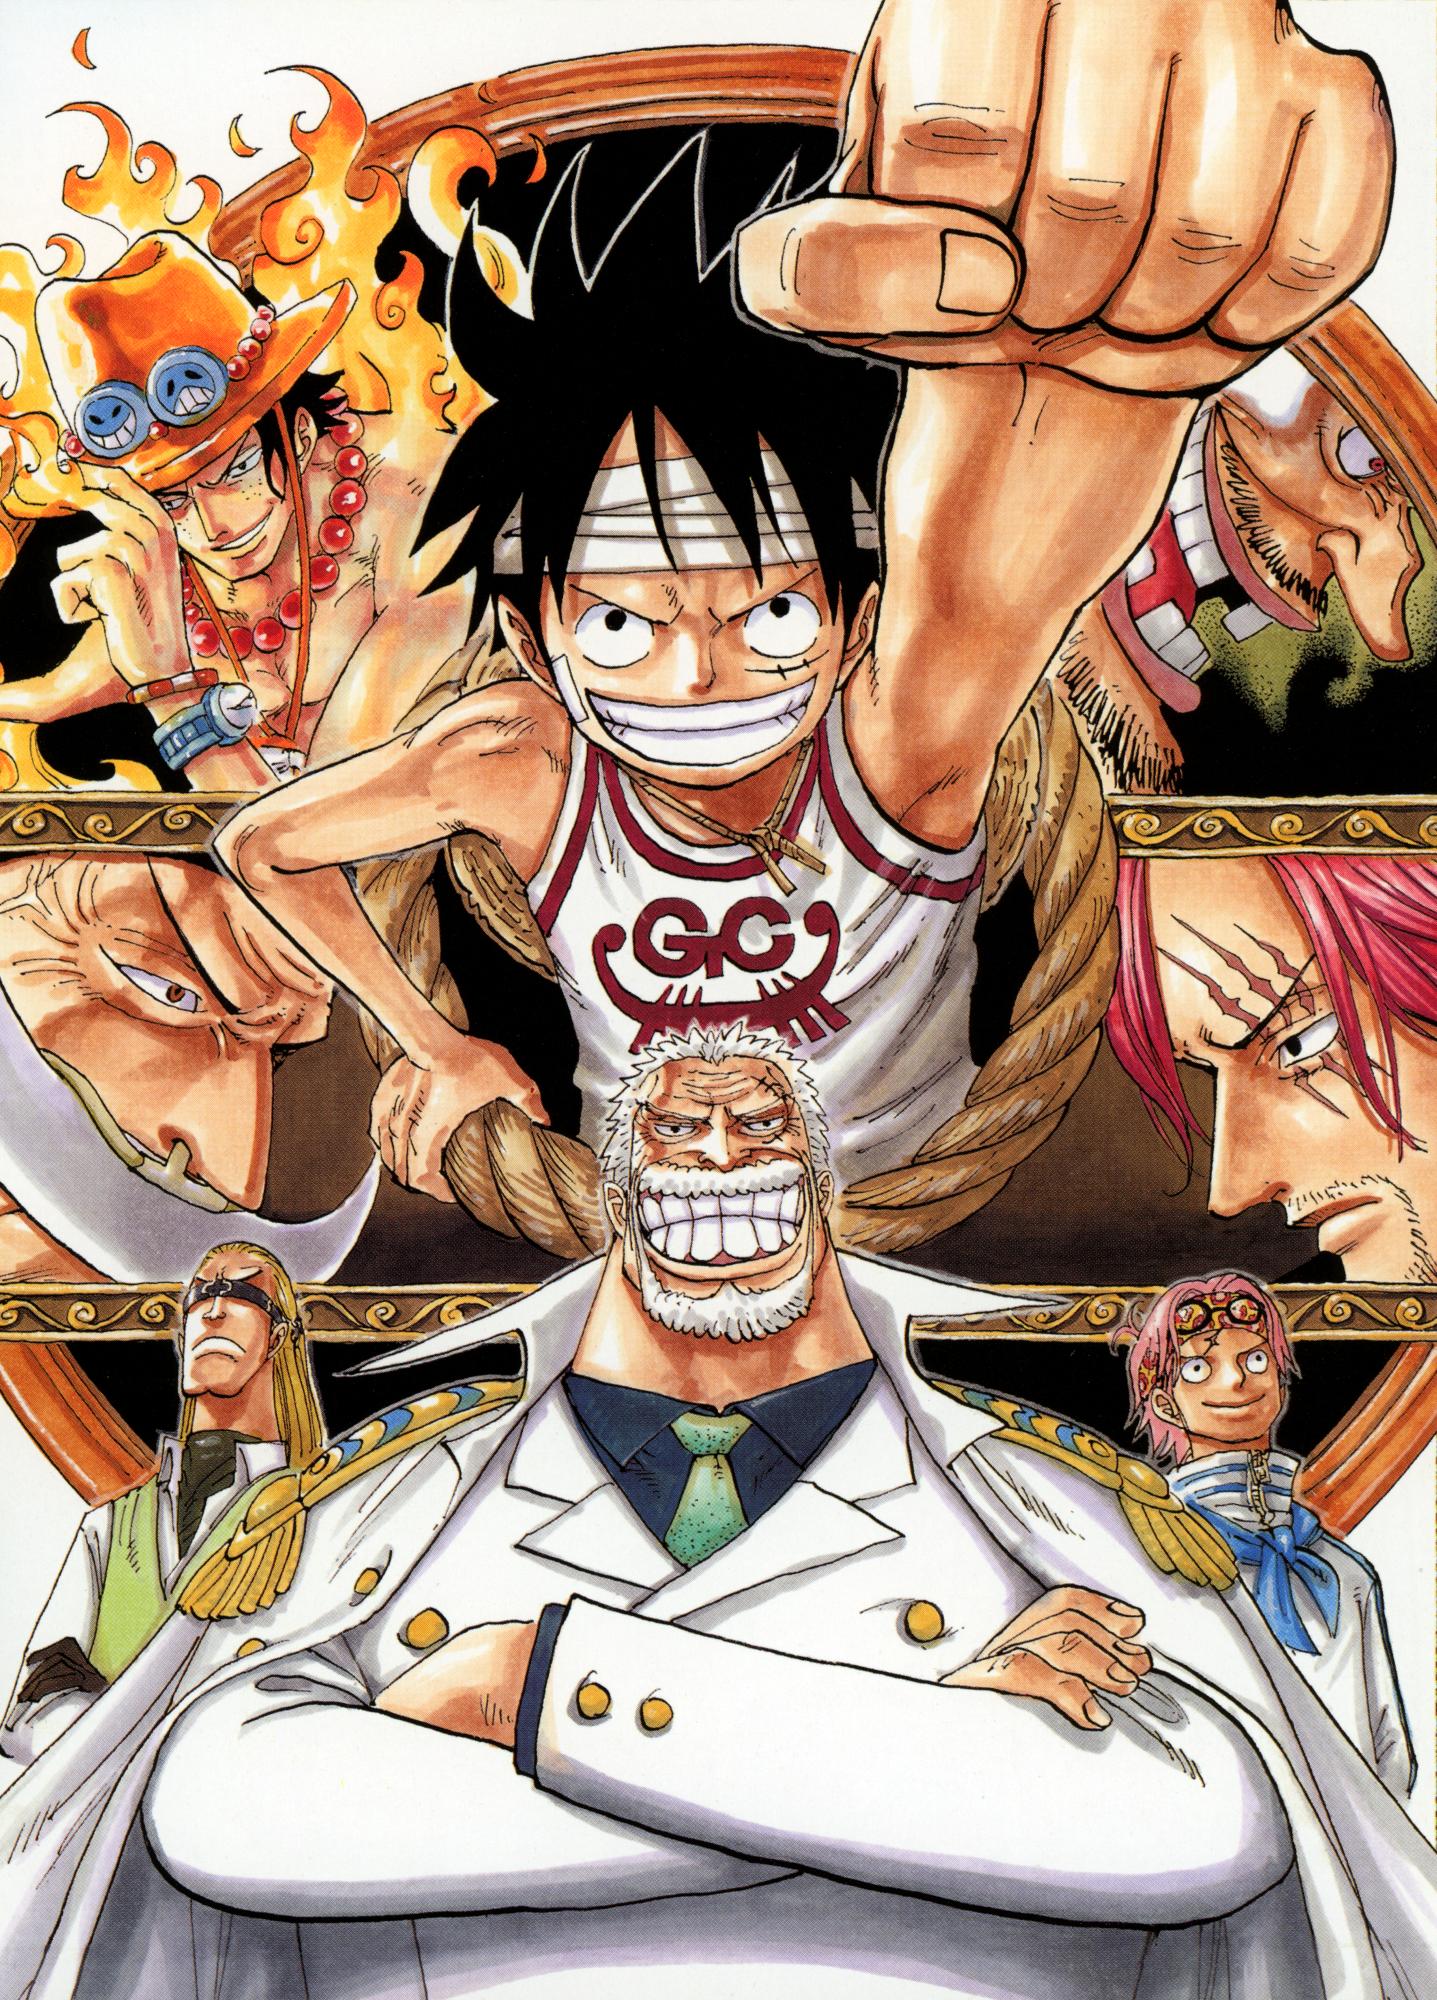 Post-Enies Lobby Arc - The One Piece Wiki - Manga, Anime ...